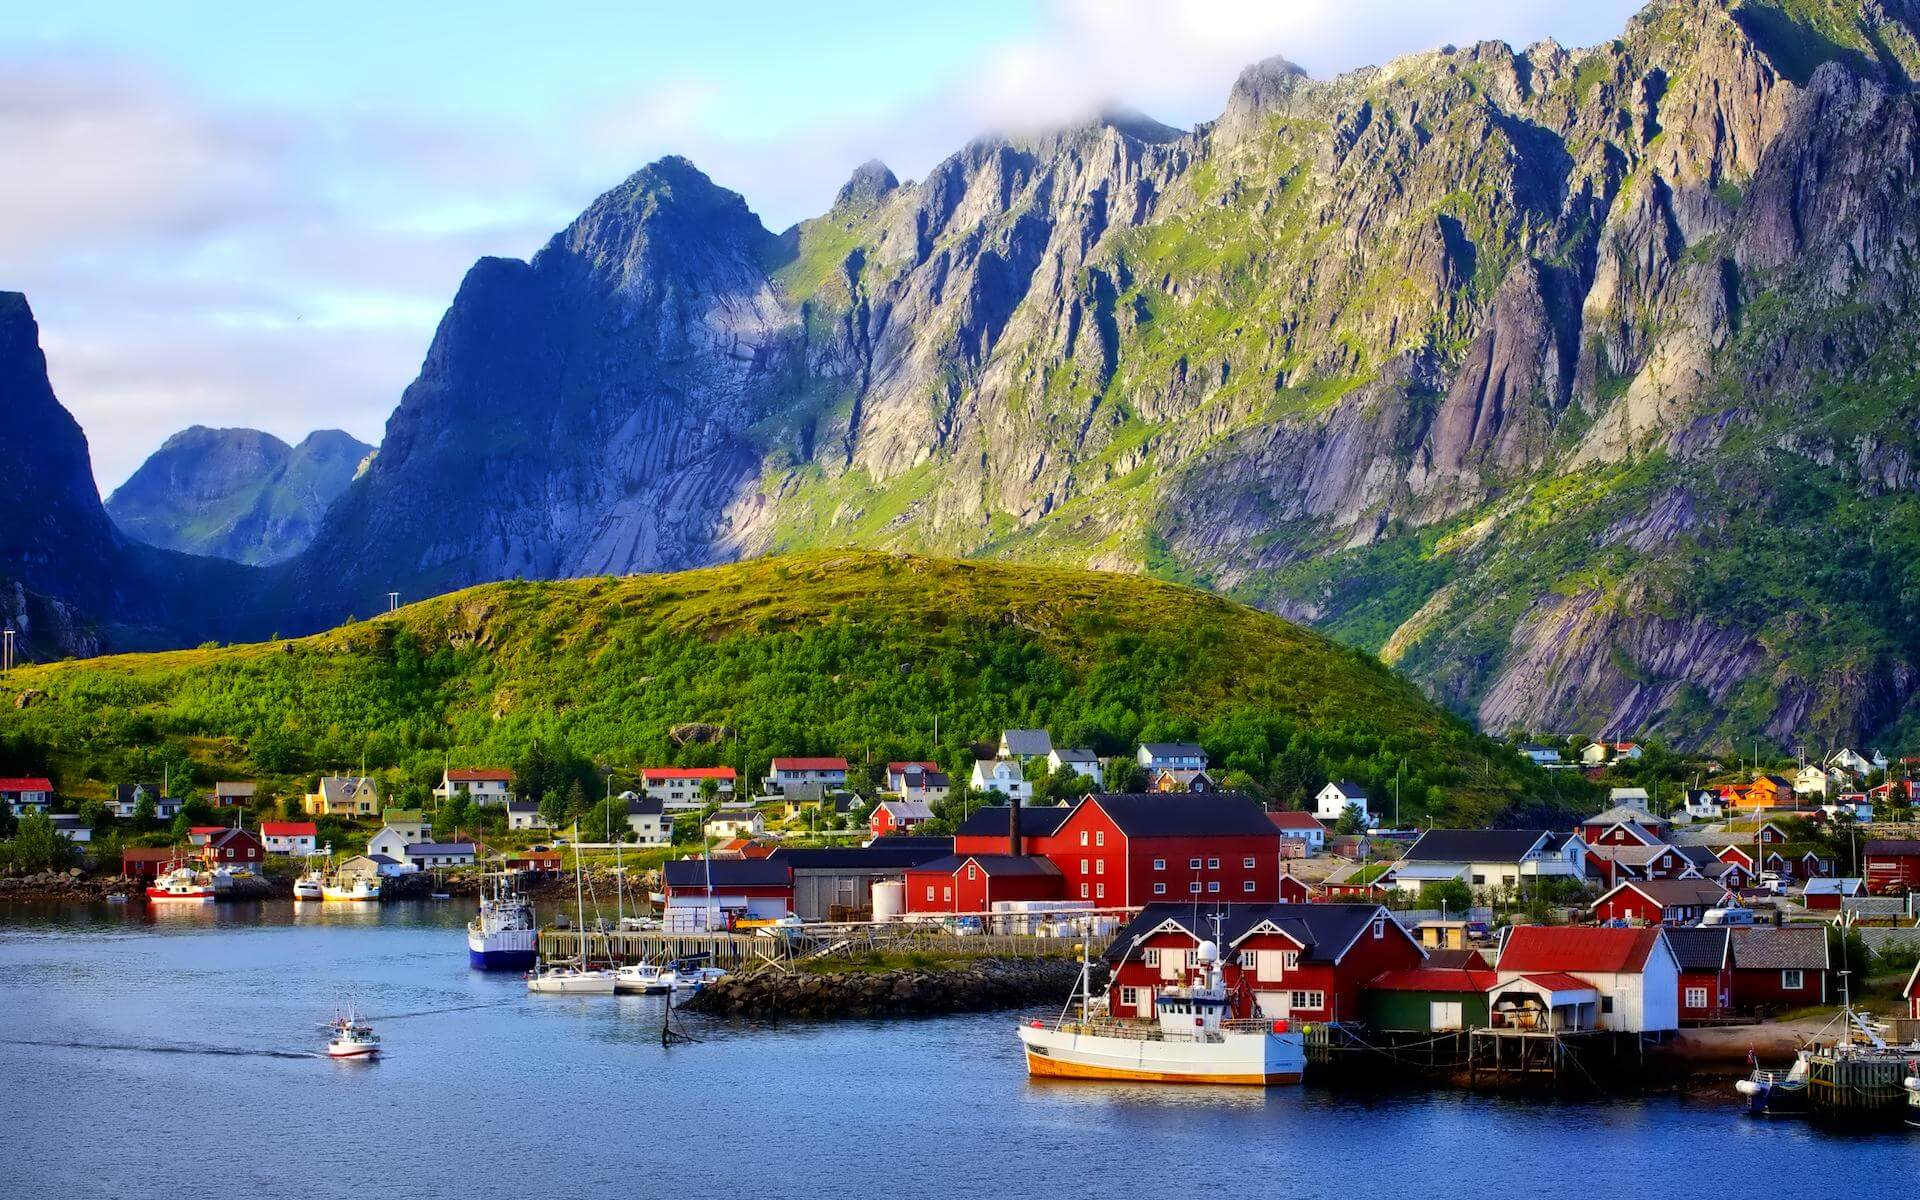 Vietnam visa service fees for Danish citizens 2019